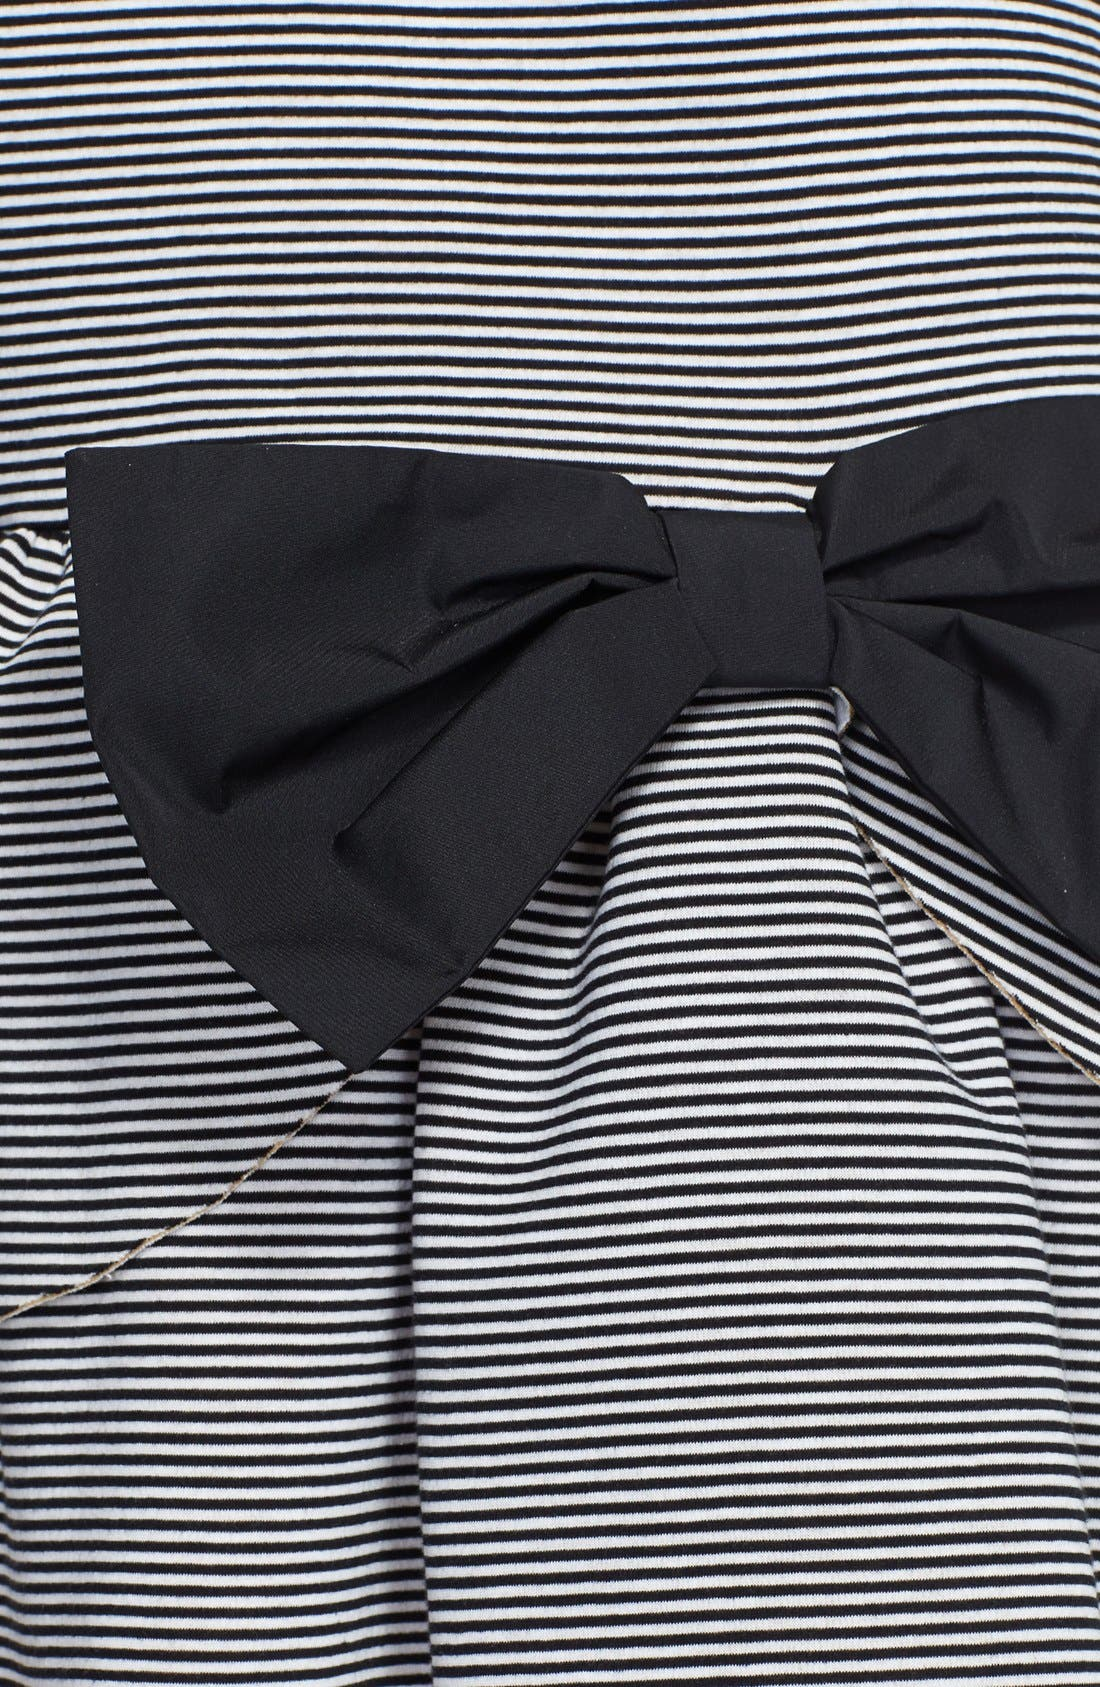 Alternate Image 3  - RED Valentino Neoprene Ruffled Stripe Dress